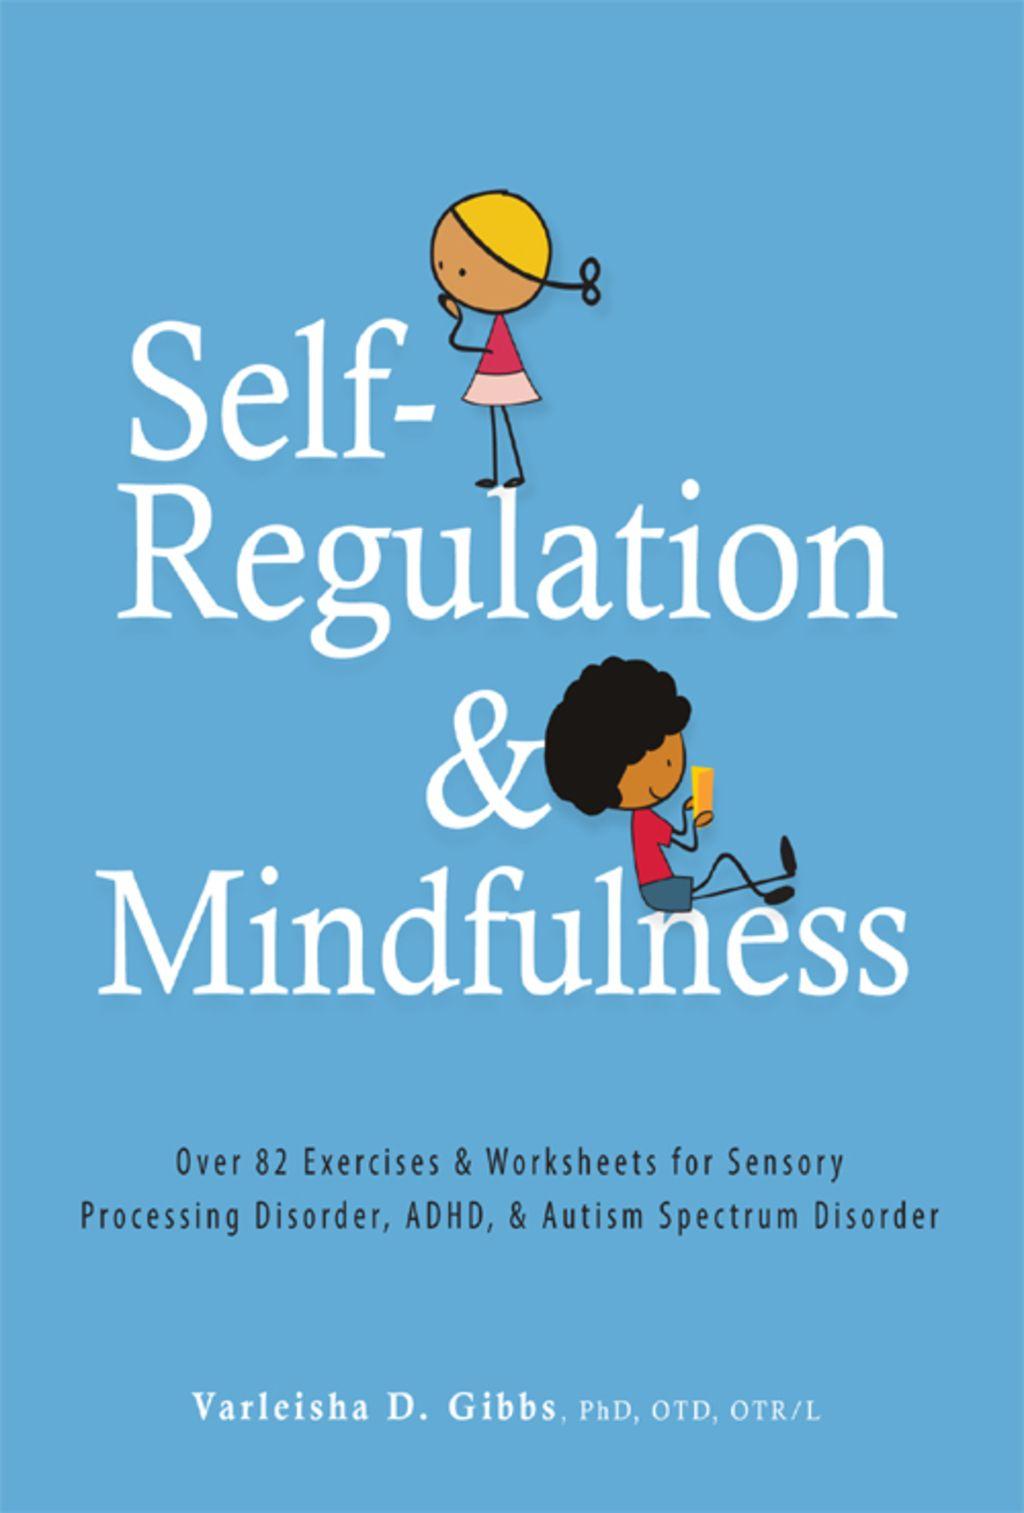 Self Regulation And Mindfulness Ebook